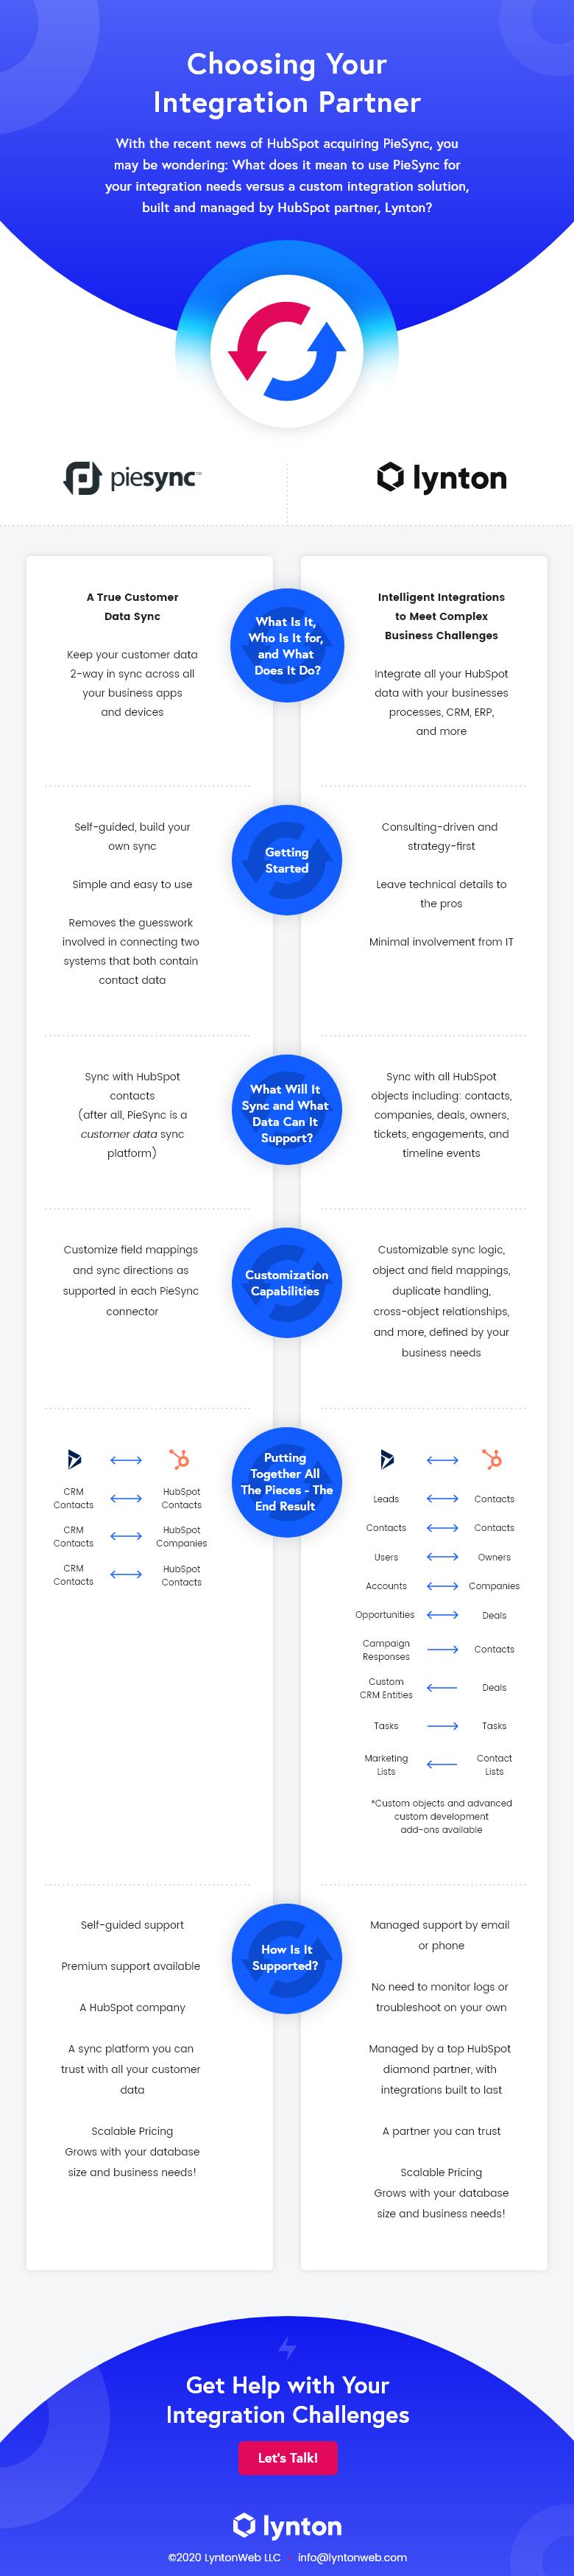 lw-piesync-infographic (2)